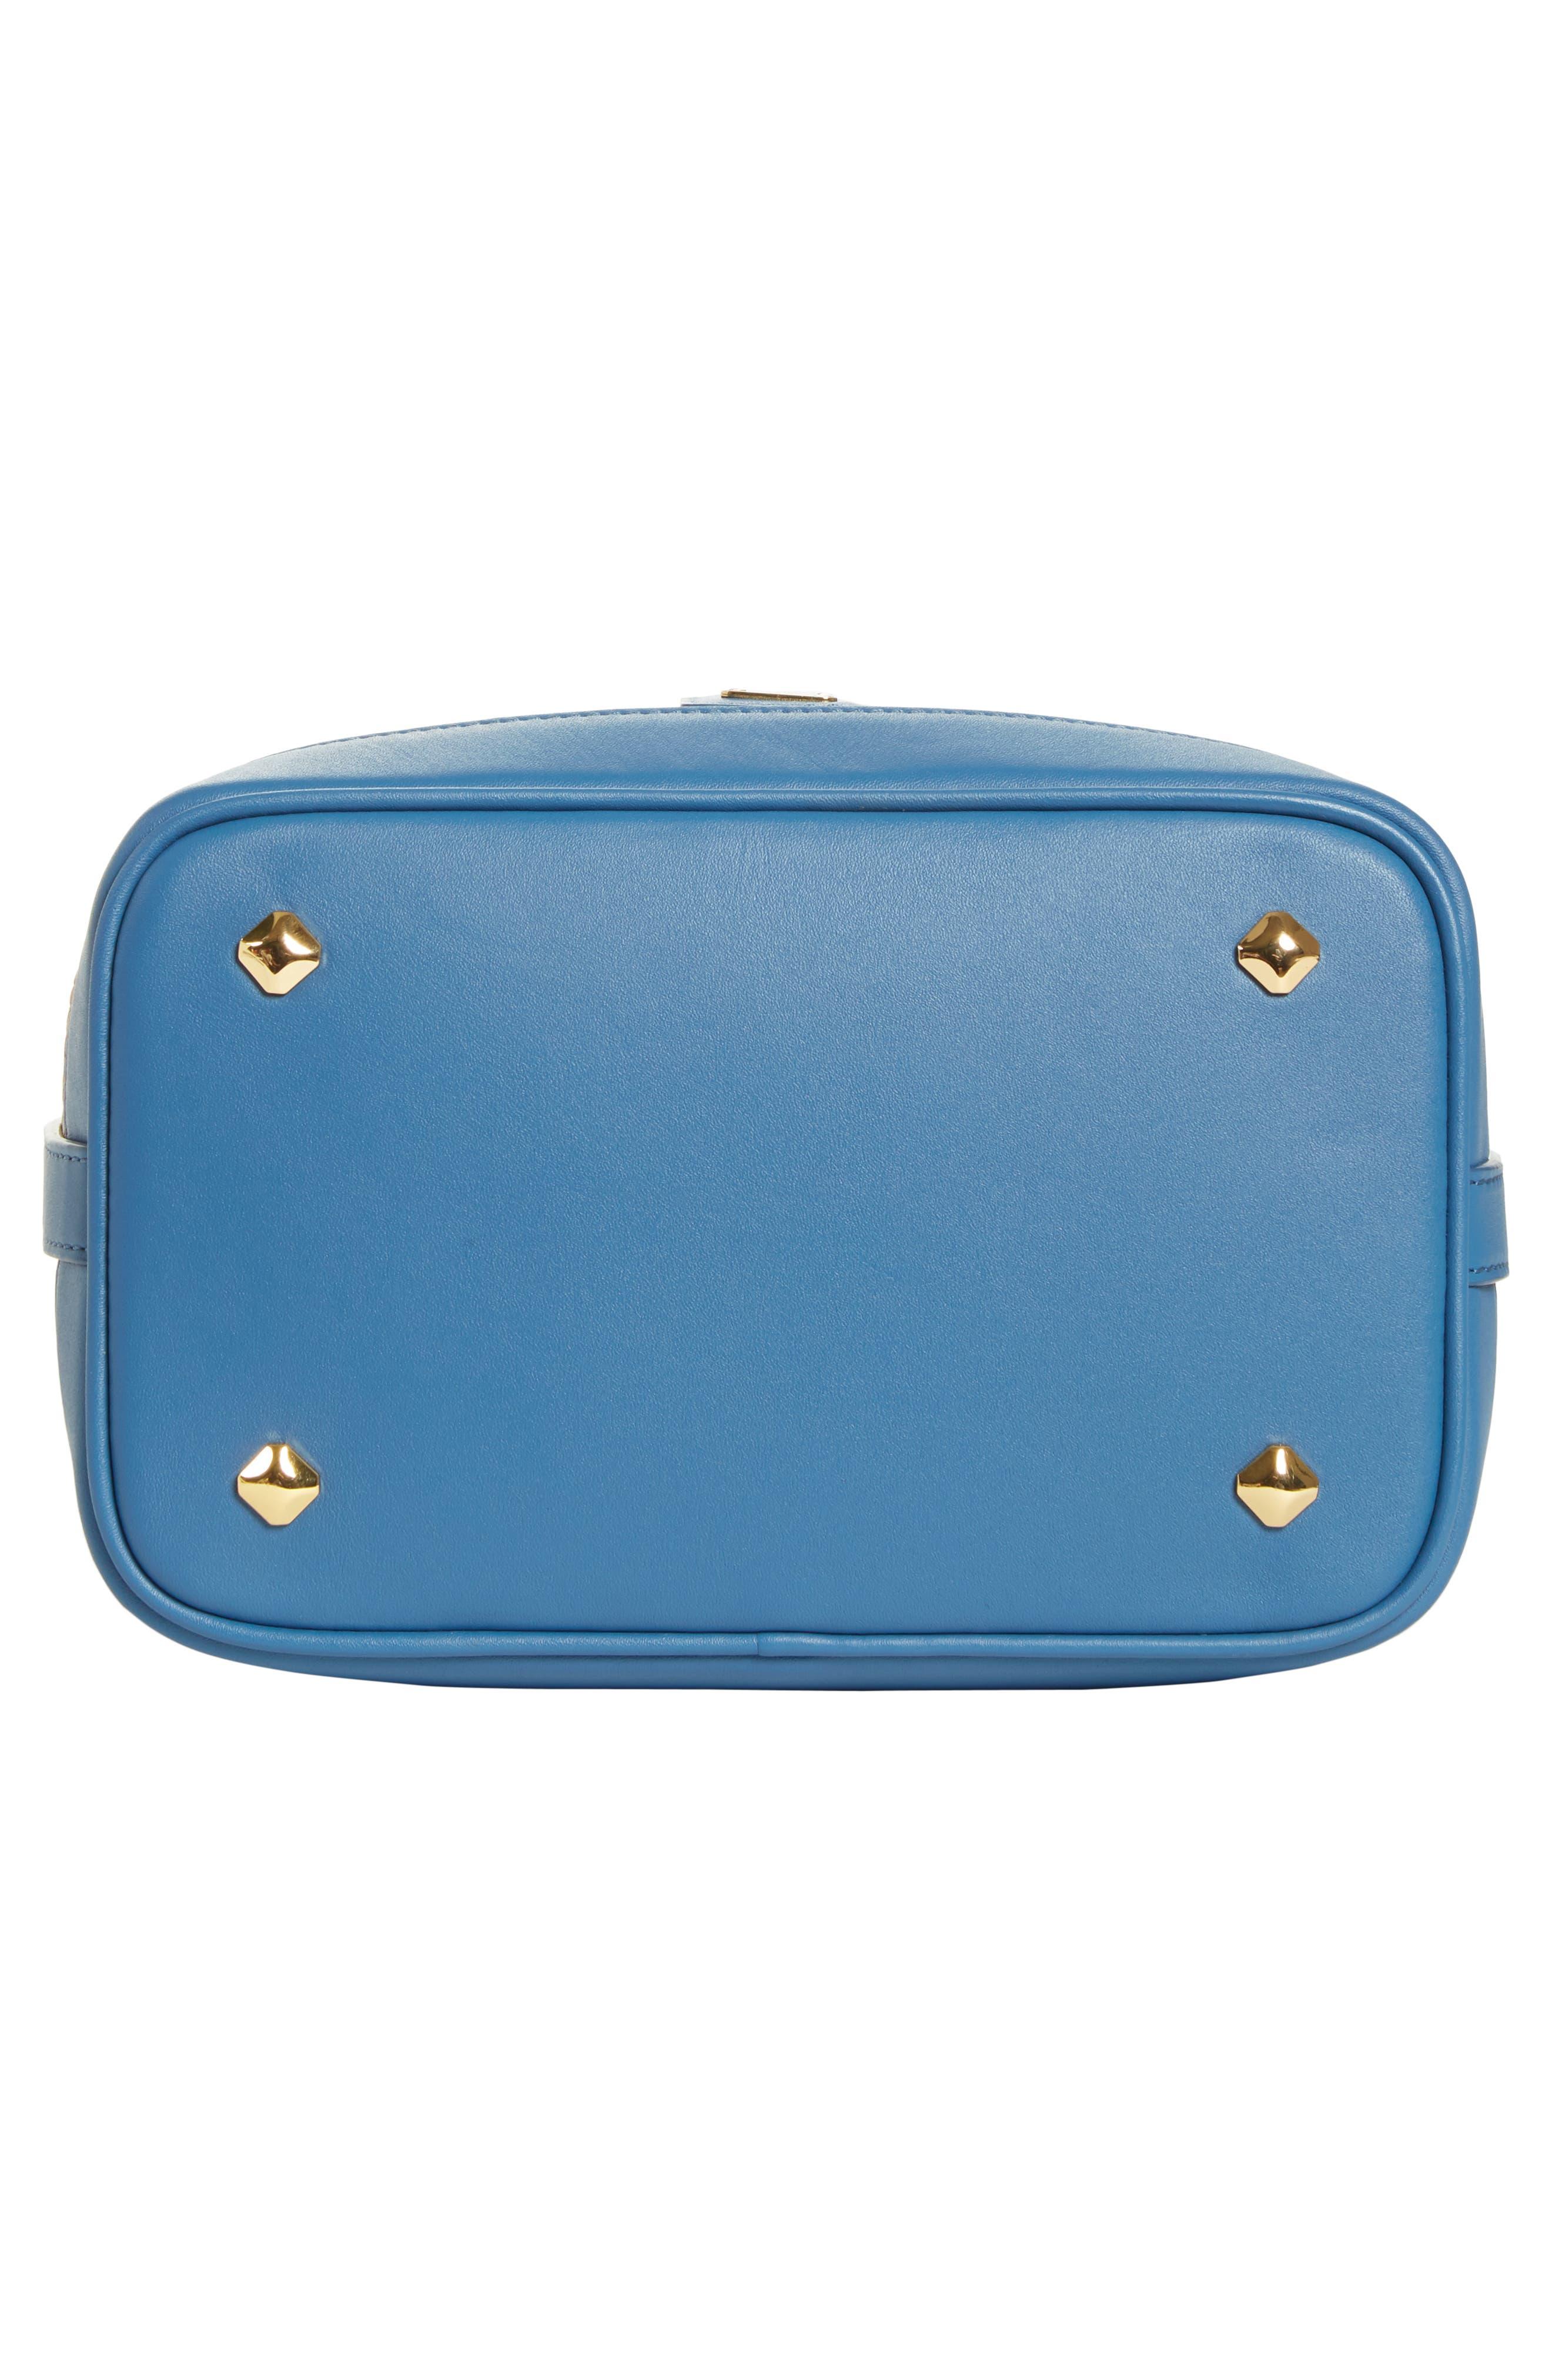 Small Visetos Drawstring Crossbody Bag,                             Alternate thumbnail 6, color,                             COGNAC/ SLATE BLUE